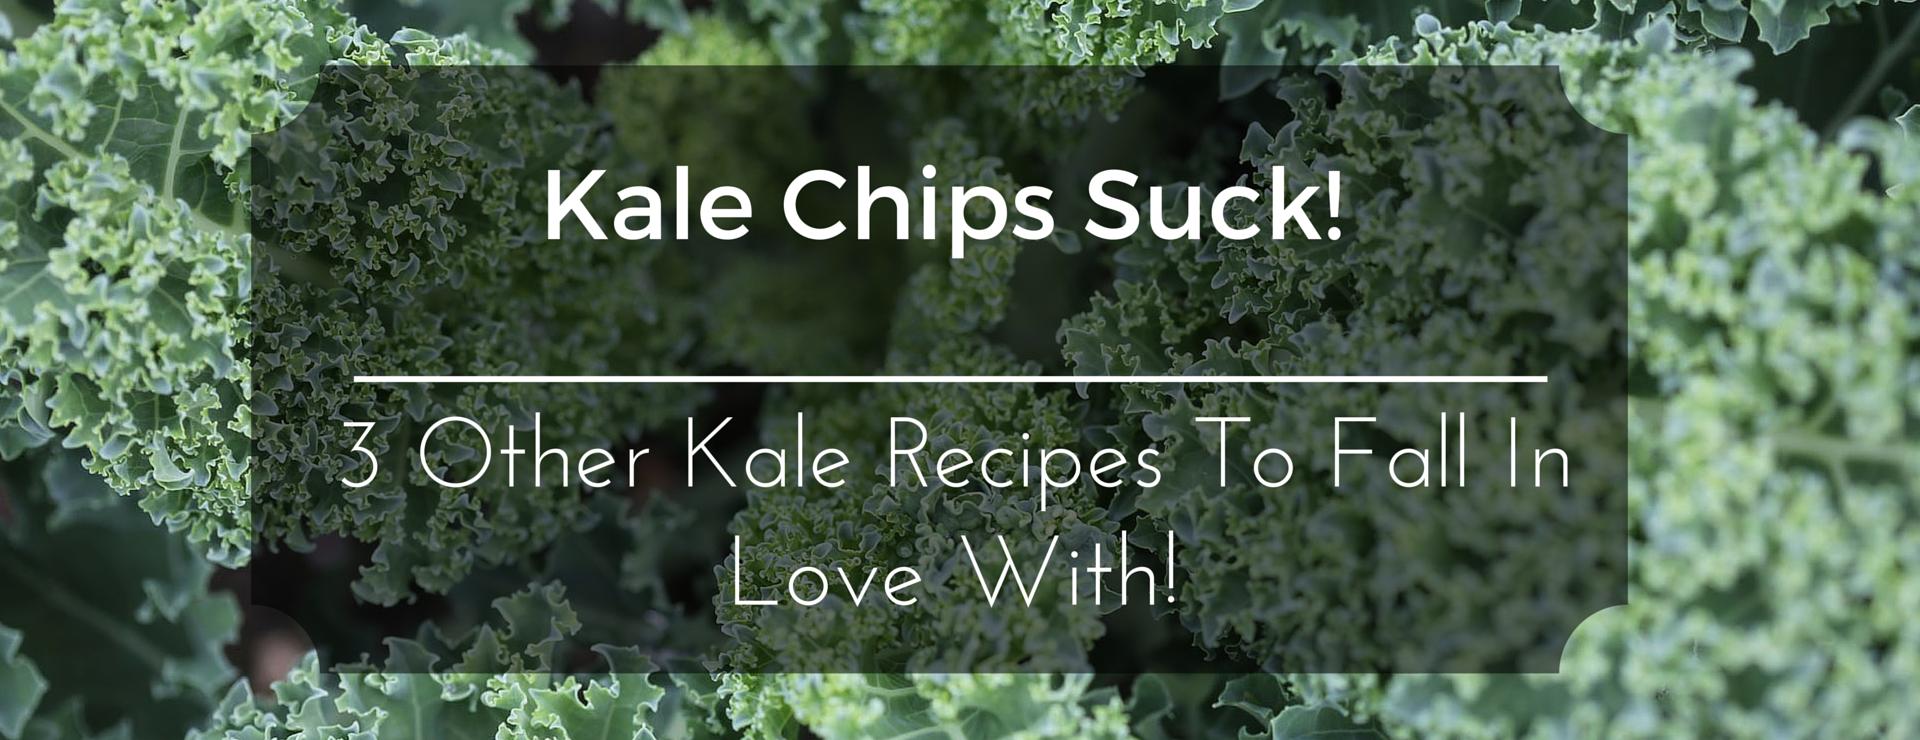 Kale Chips Suck Banner